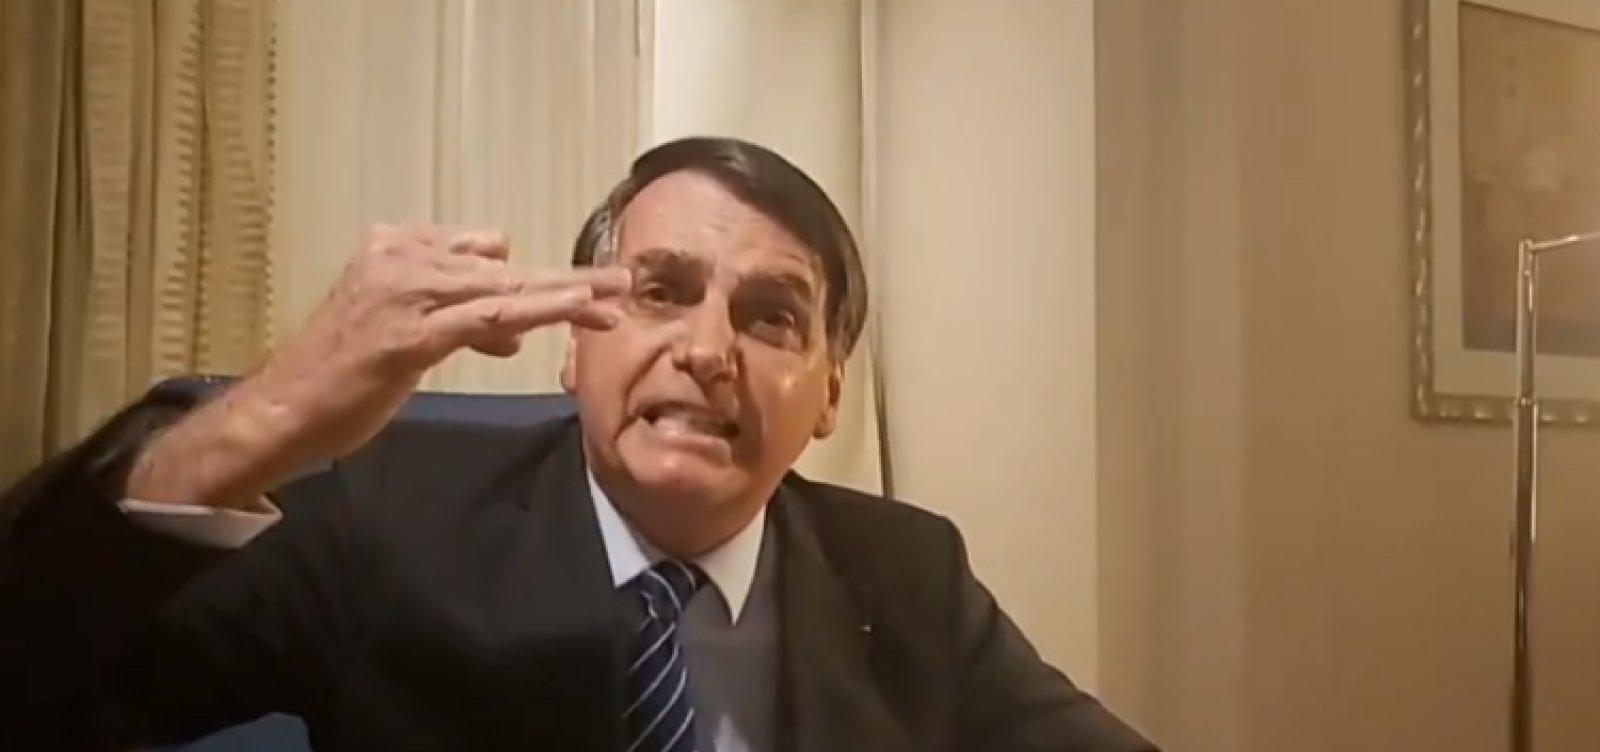 [Após matéria do caso Marielle, Bolsonaro ataca Globo e Witzel ]